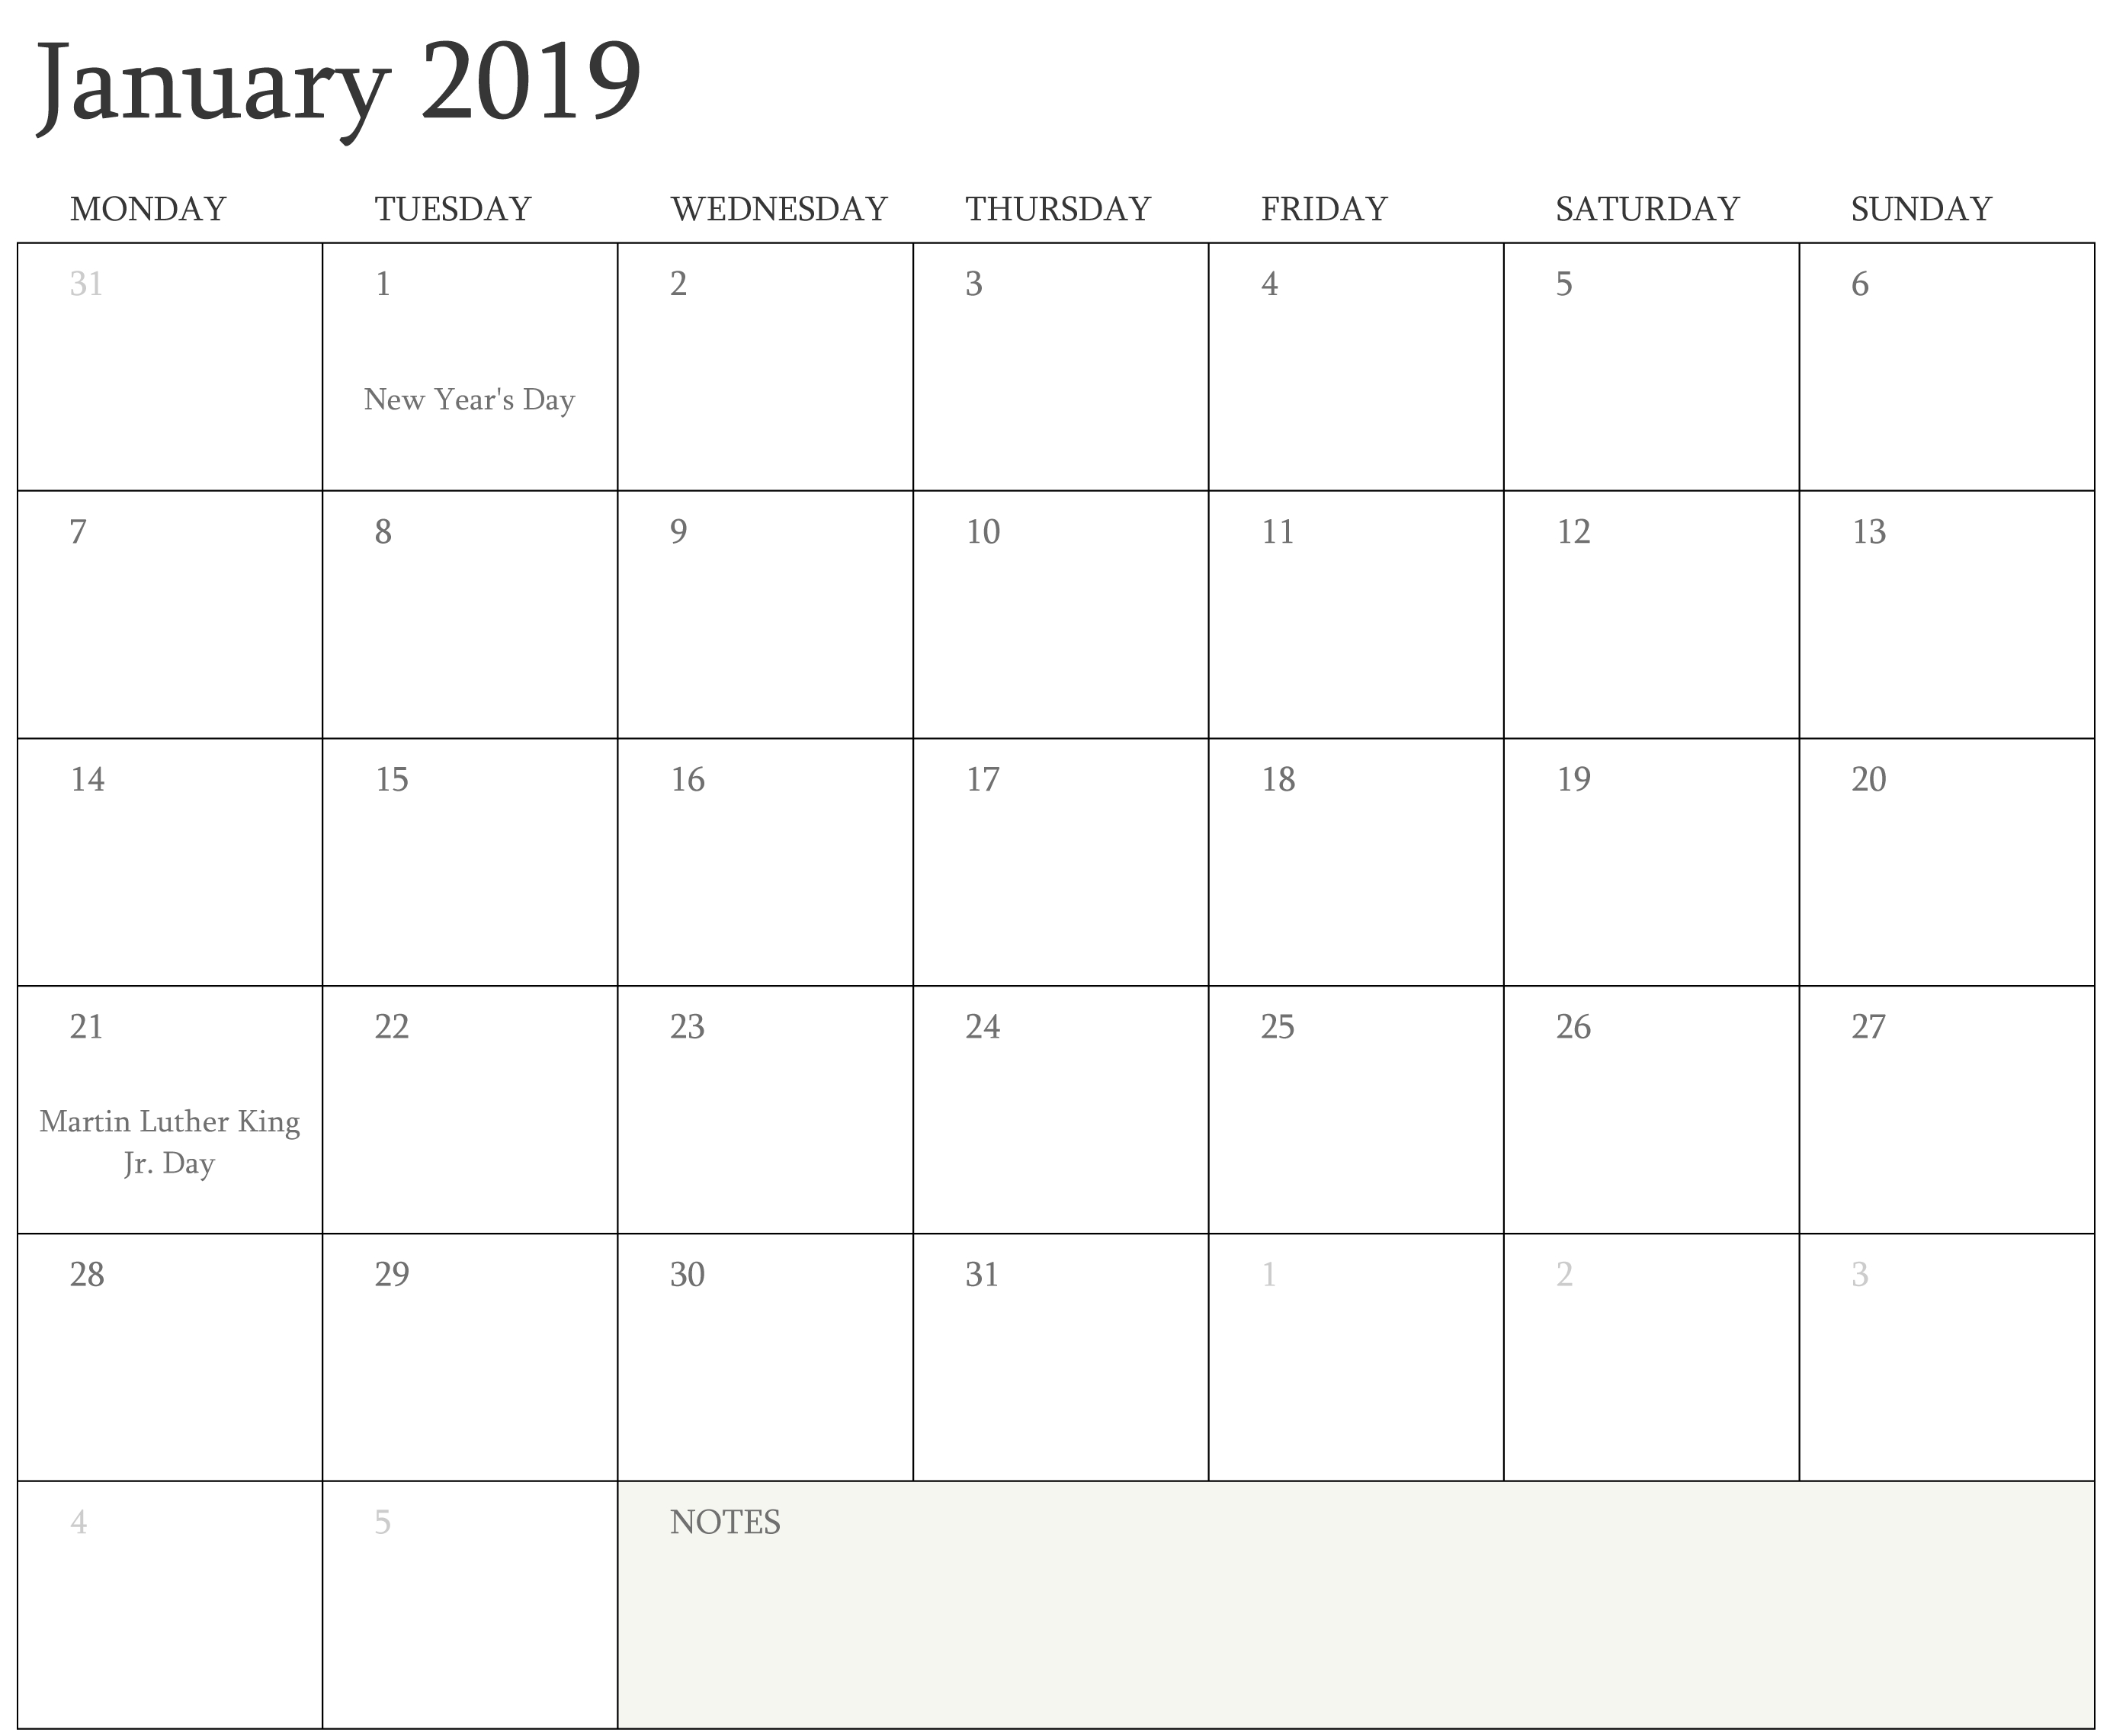 Print Calendar January 2019 Template - Free Printable 2018 Calendar Calendar 2019 Fillable